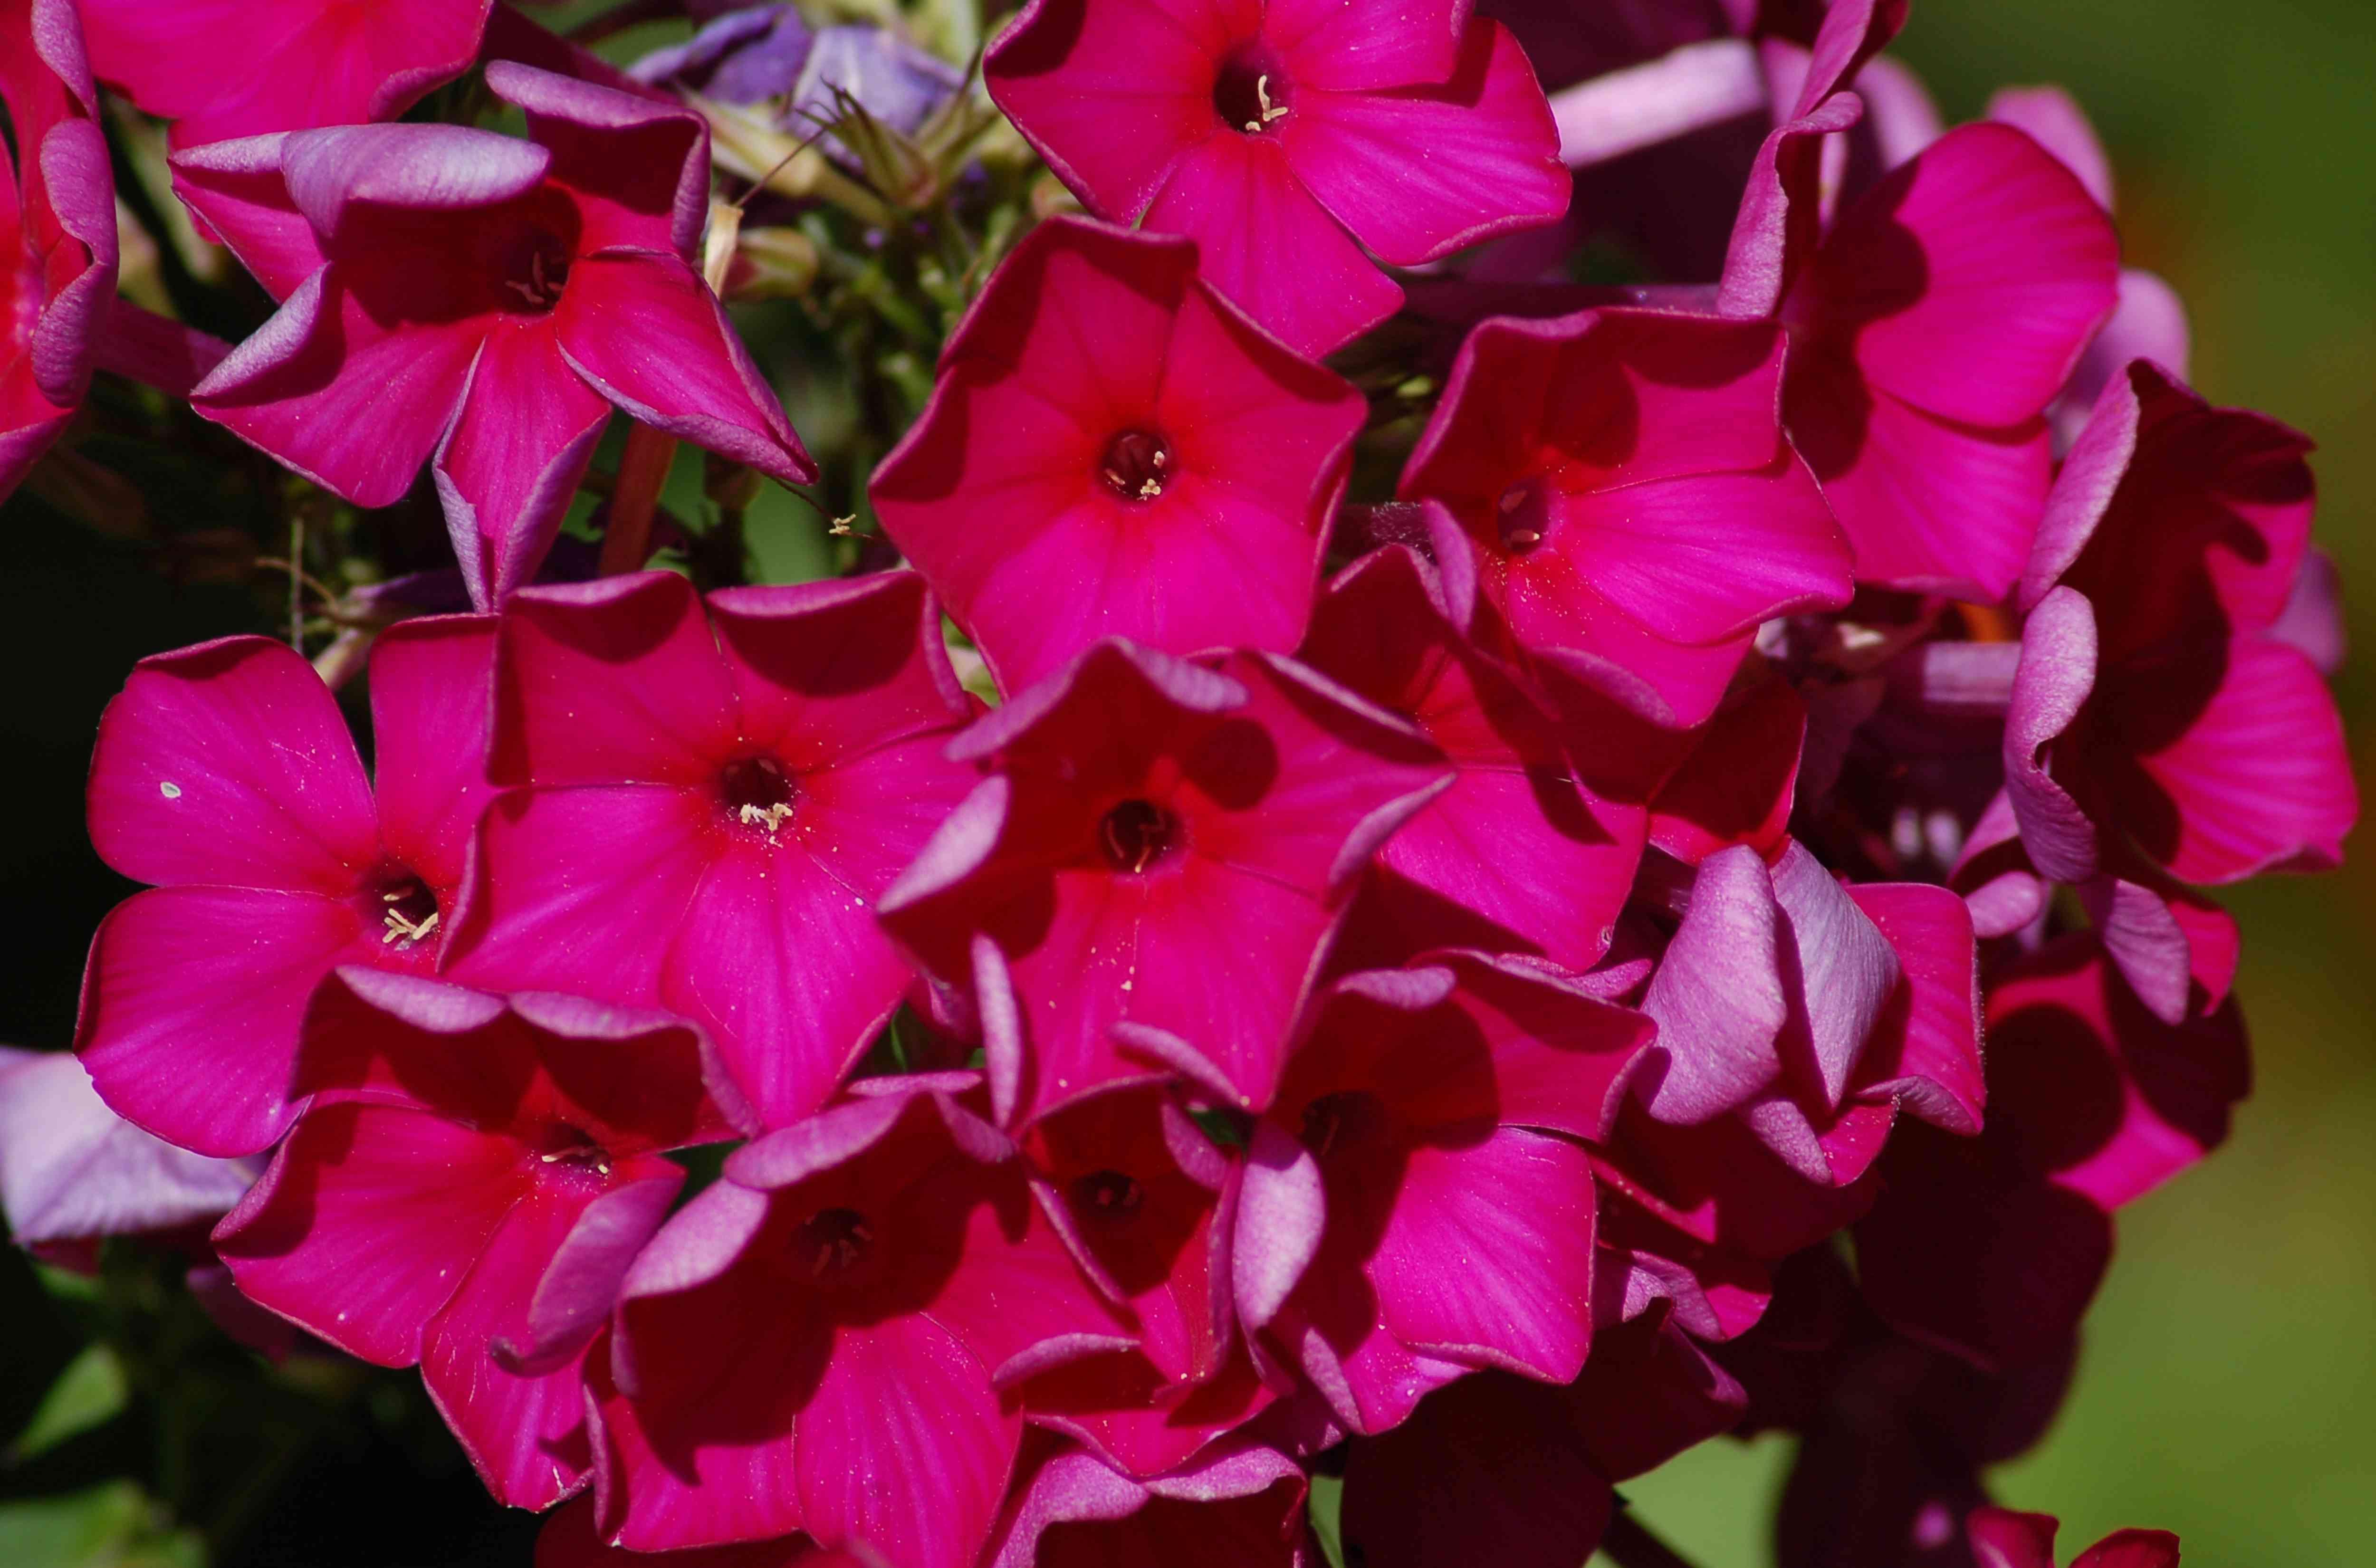 Closeup of Red Magic phlox flowers.